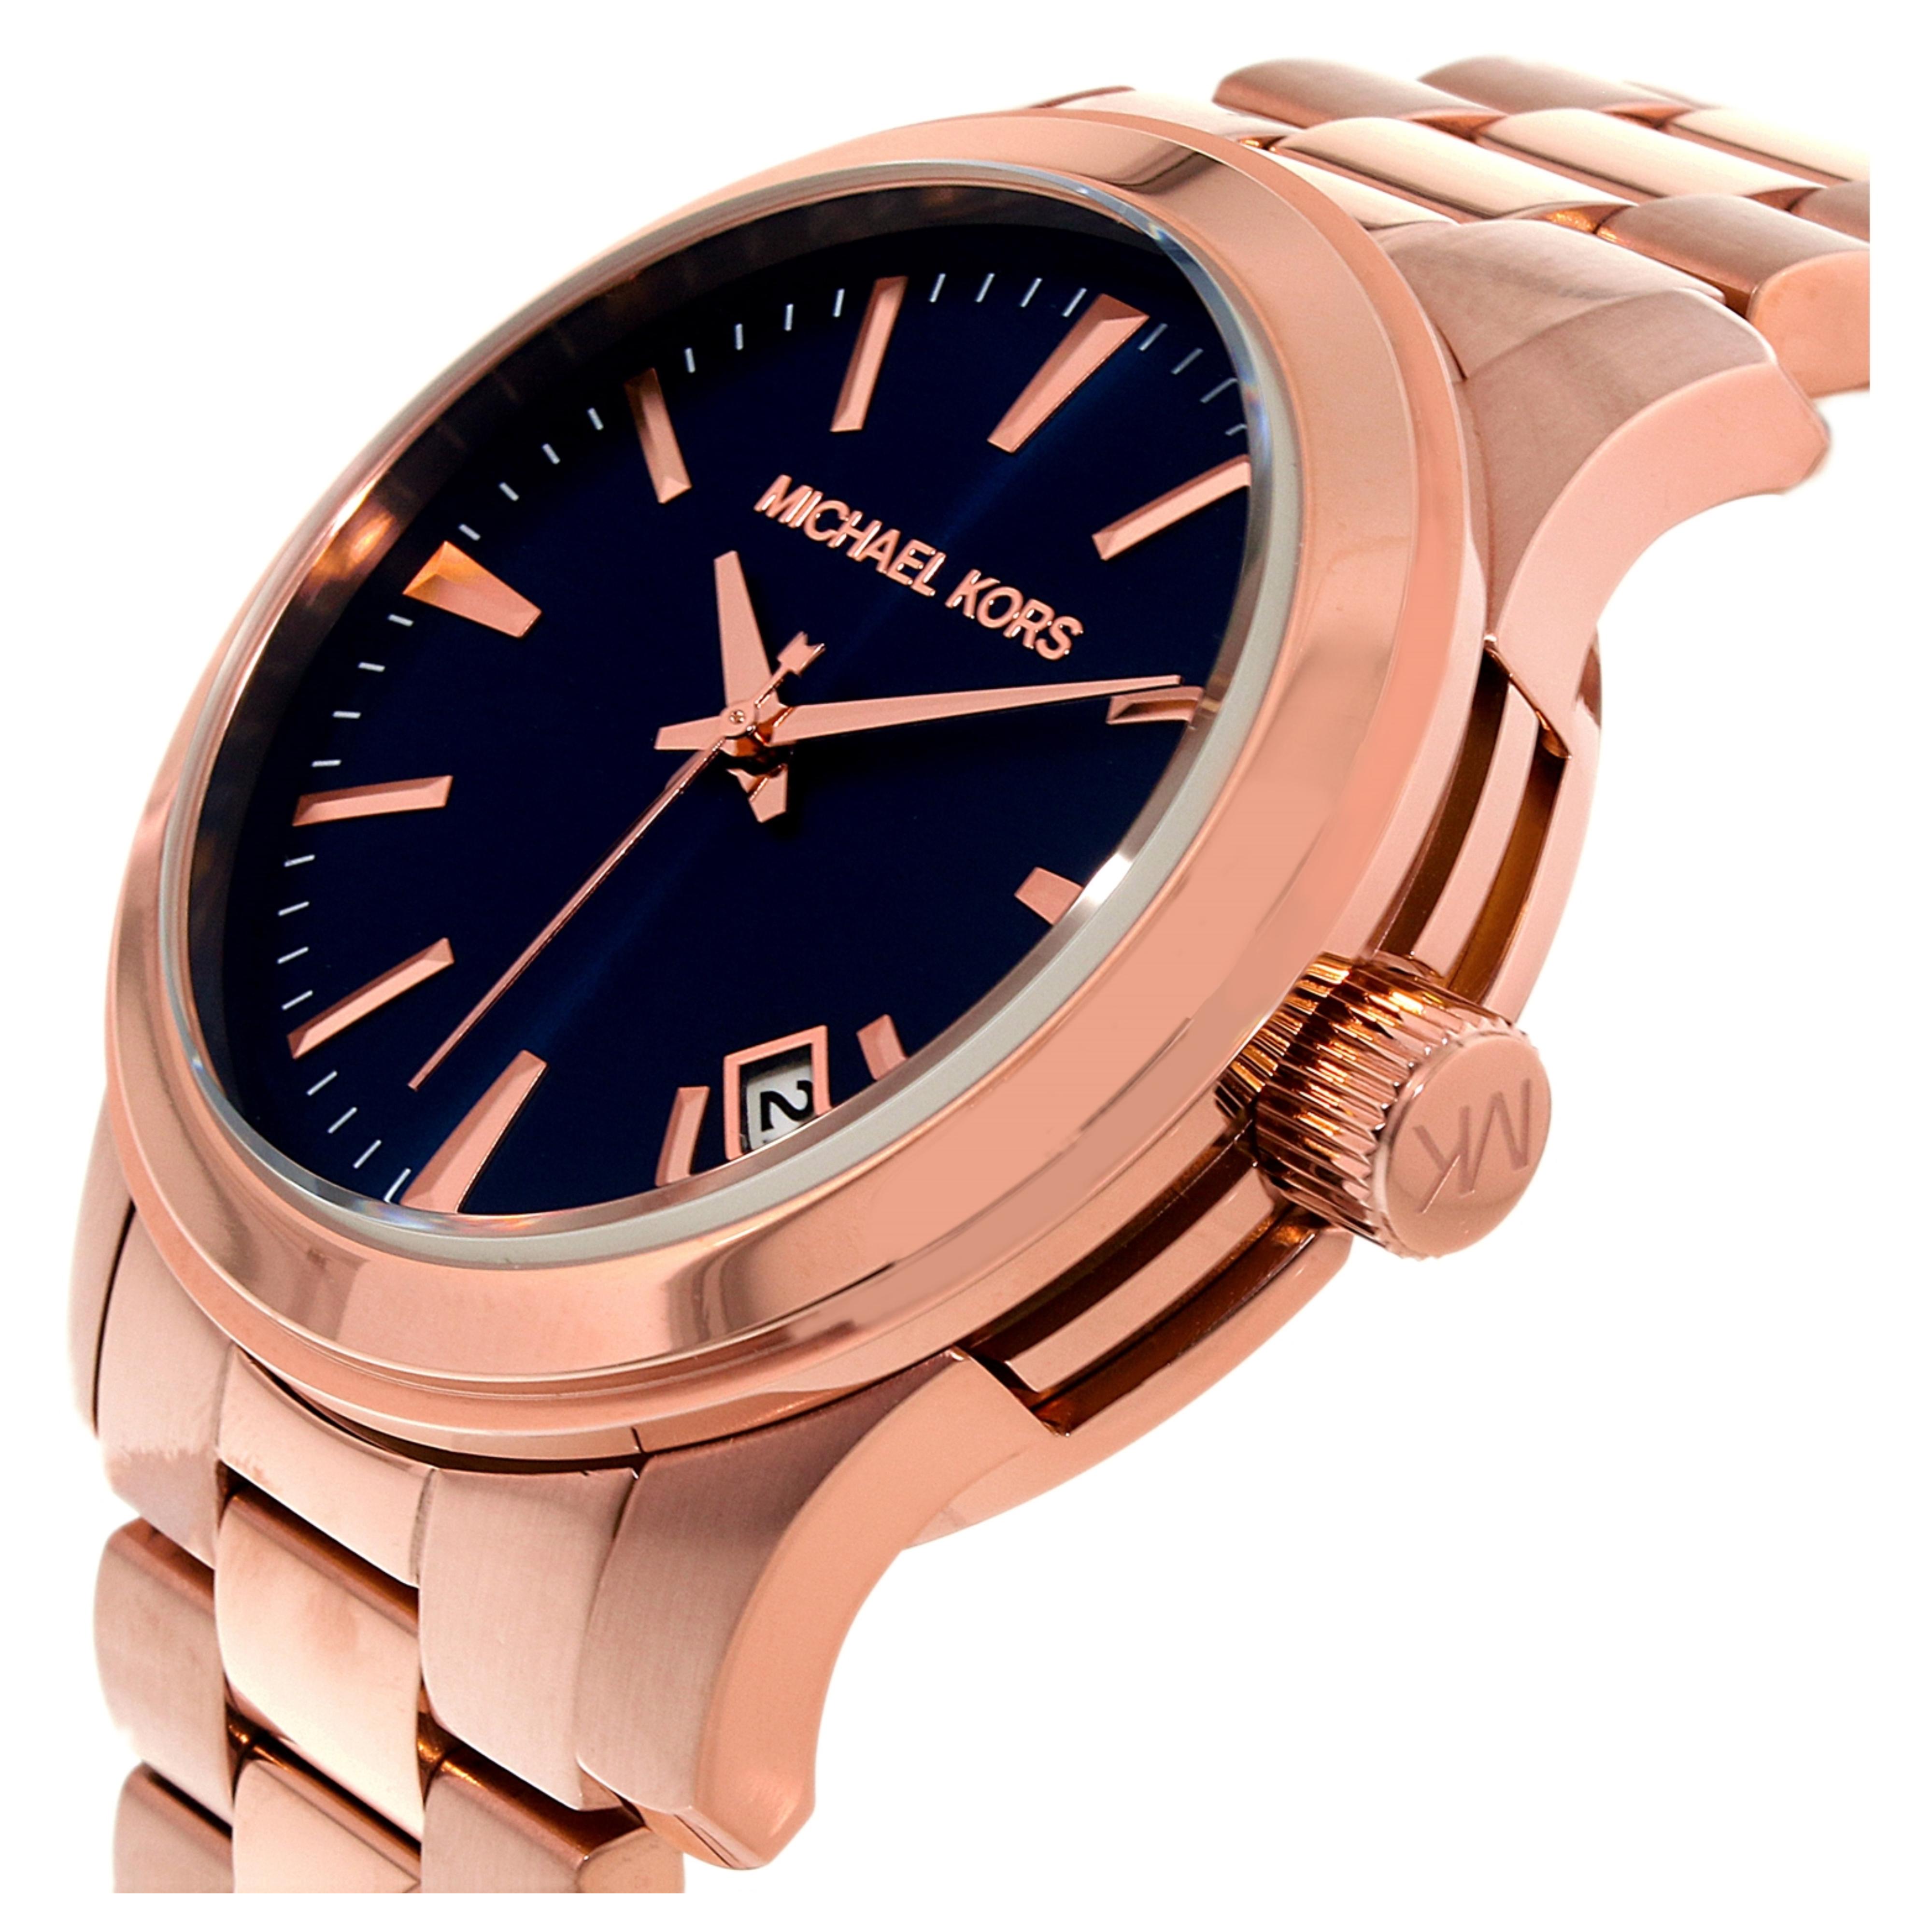 b7164d29475b Michael Kors Runway Men s Formal Watch MK7065